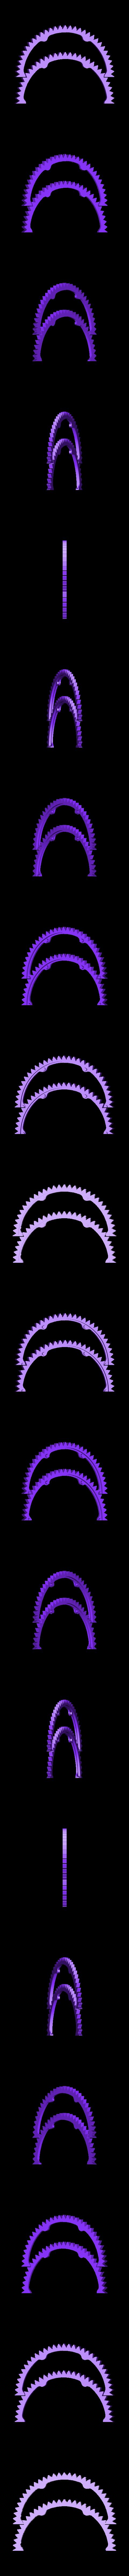 Spirograph _ Prusament Spool_by Dominik Cisar_005.stl Download free STL file SPIROGRAPH - PRUSAMENT SPOOL - reuse idea • 3D print model, cisardom